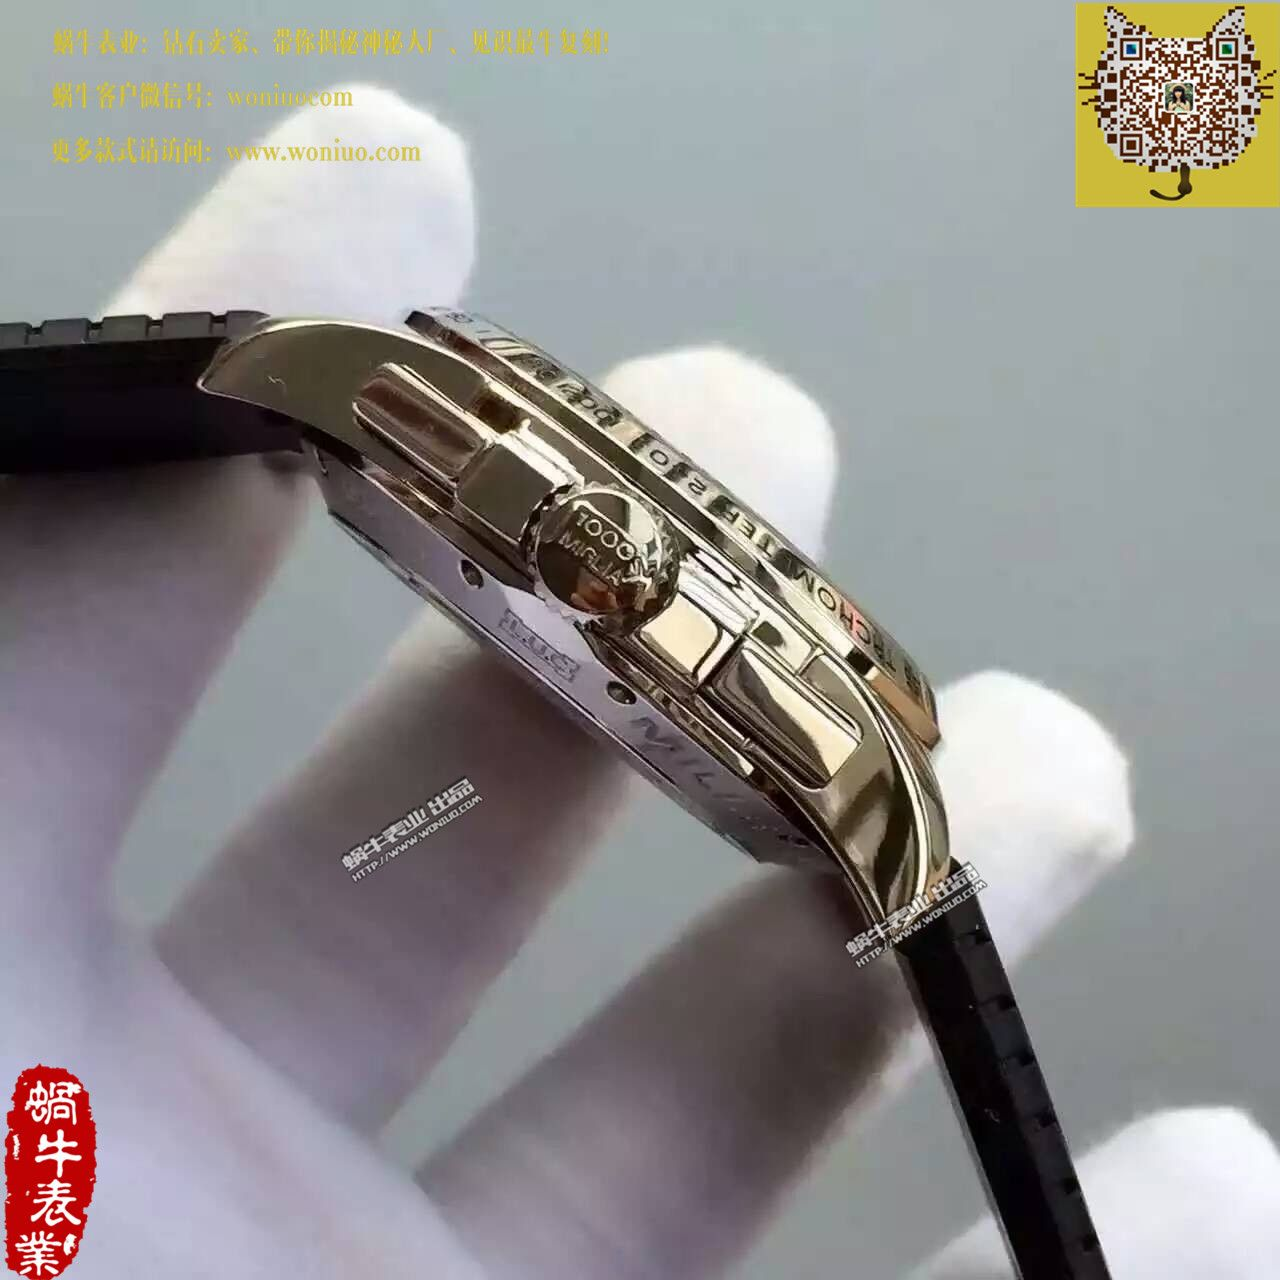 【HBBV6厂顶级复刻手表】萧邦经典赛车系列168459-3005腕表 / XB011